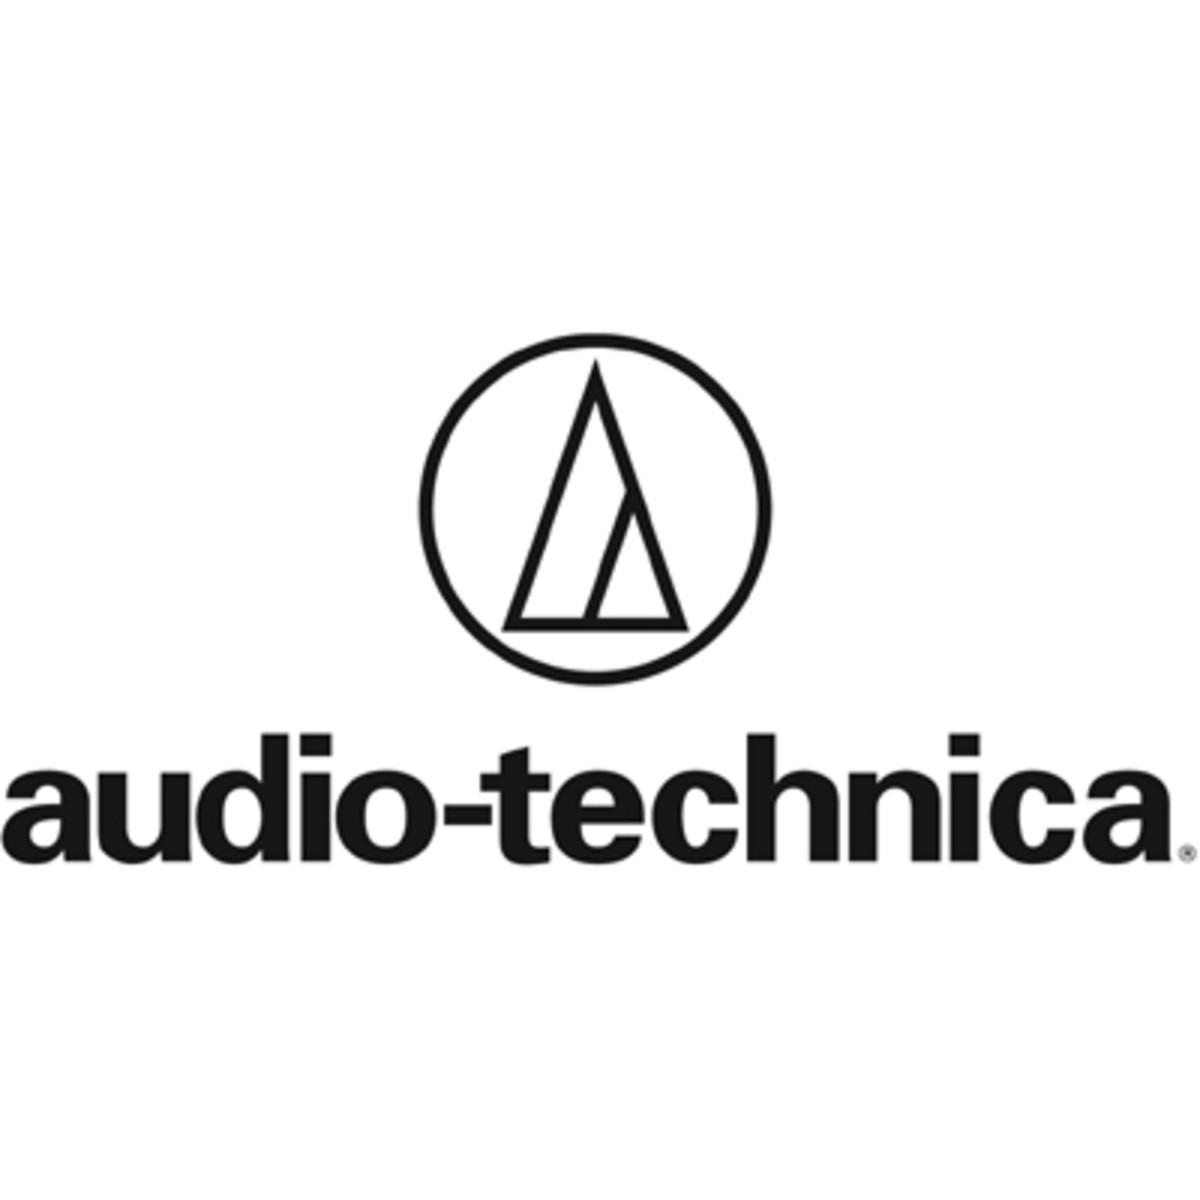 audiotechnicalogo.jpg